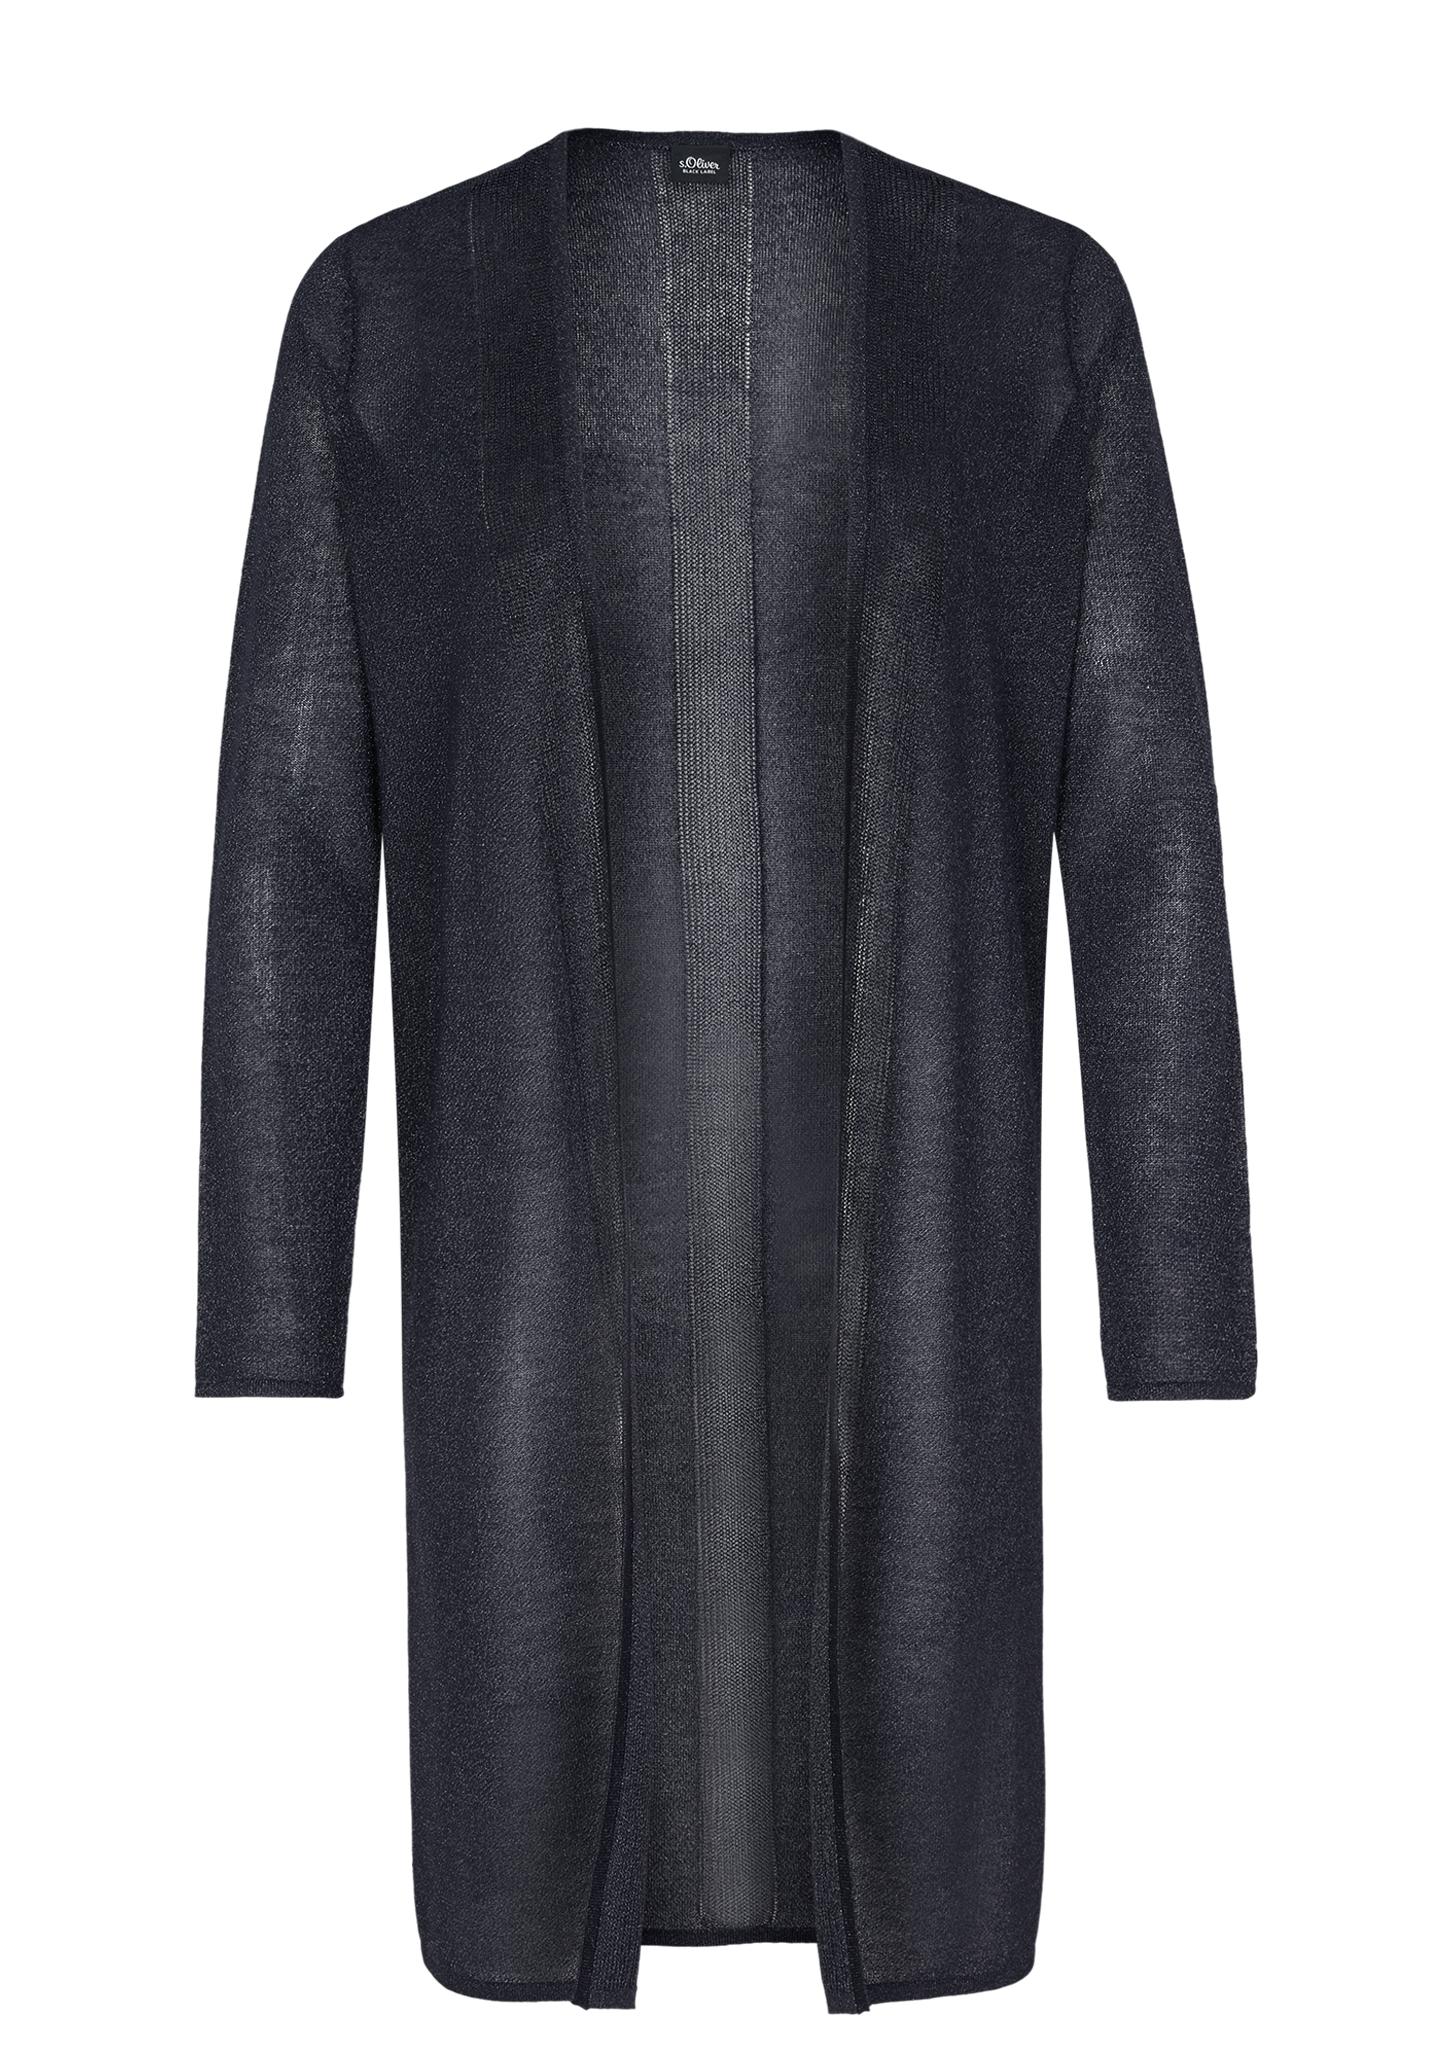 Strickmantel | Bekleidung > Strickjacken & -mäntel > Strickmäntel | Blau | 84% viskose -  16% polyester | s.Oliver BLACK LABEL